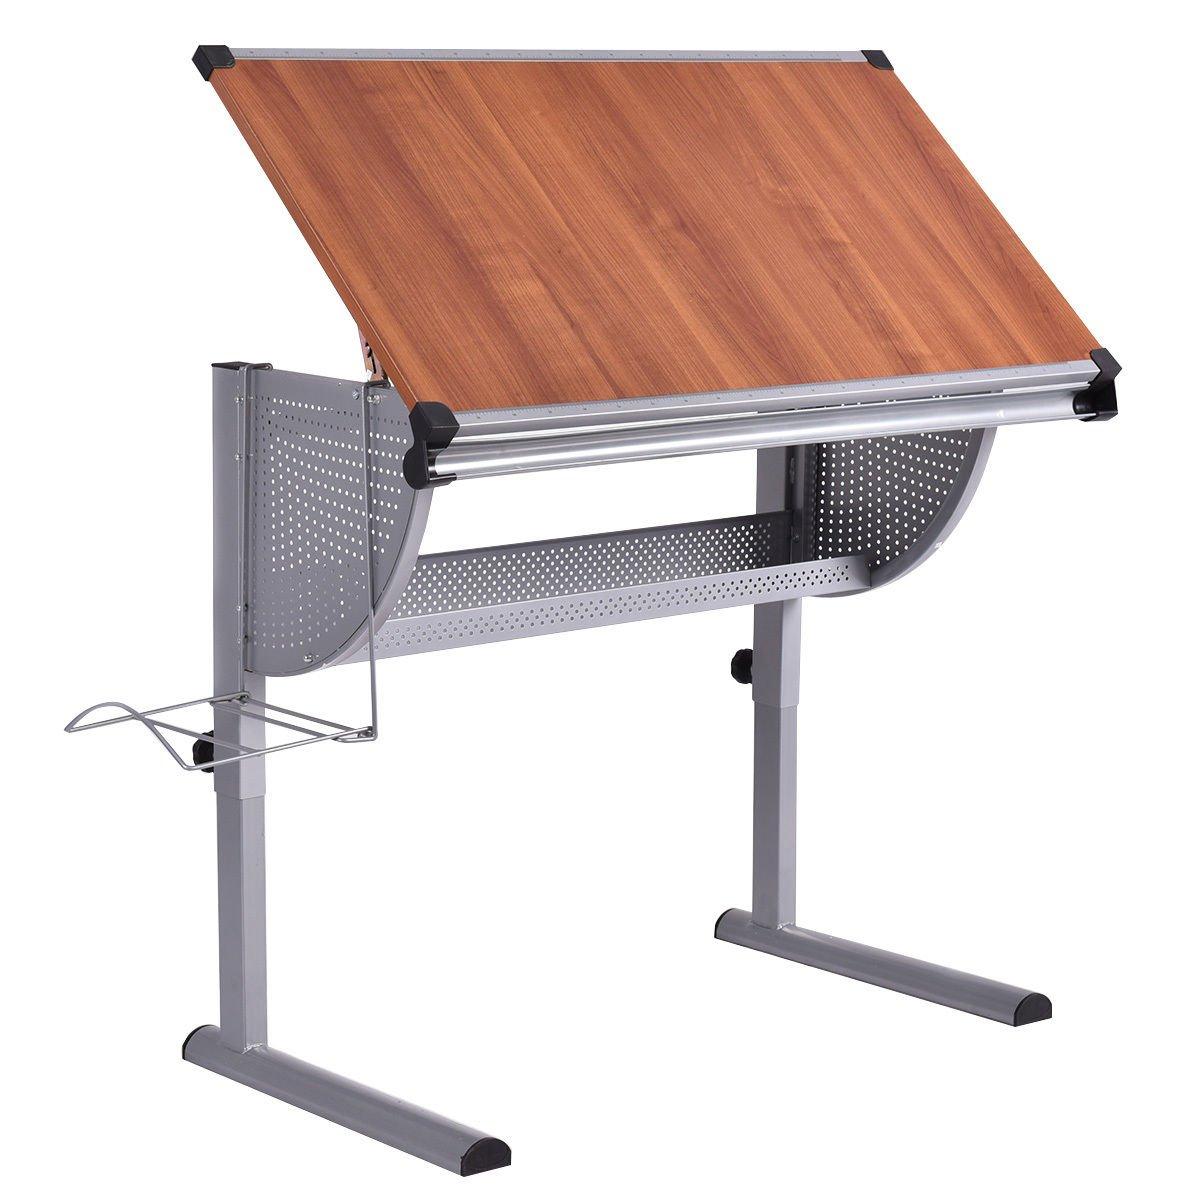 Tangkula Drafting Table Drawing Desk Adjustable Art & Craft Hobby Studio Architect Work (Yellow)